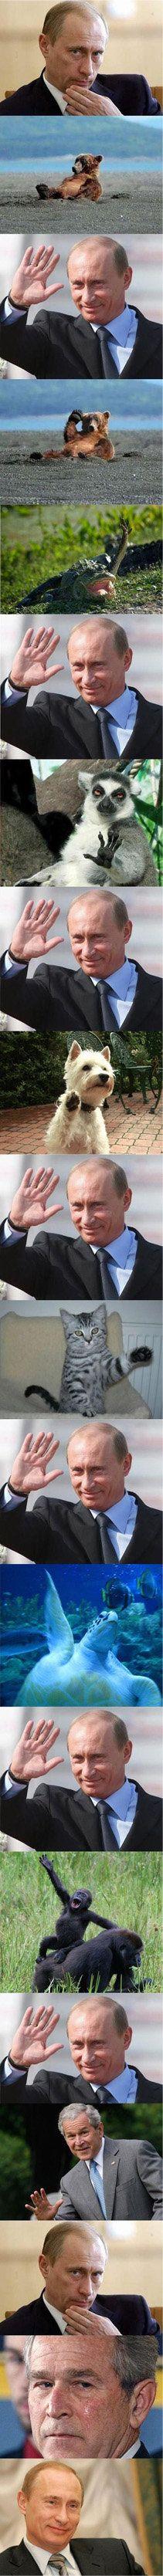 Putin friends